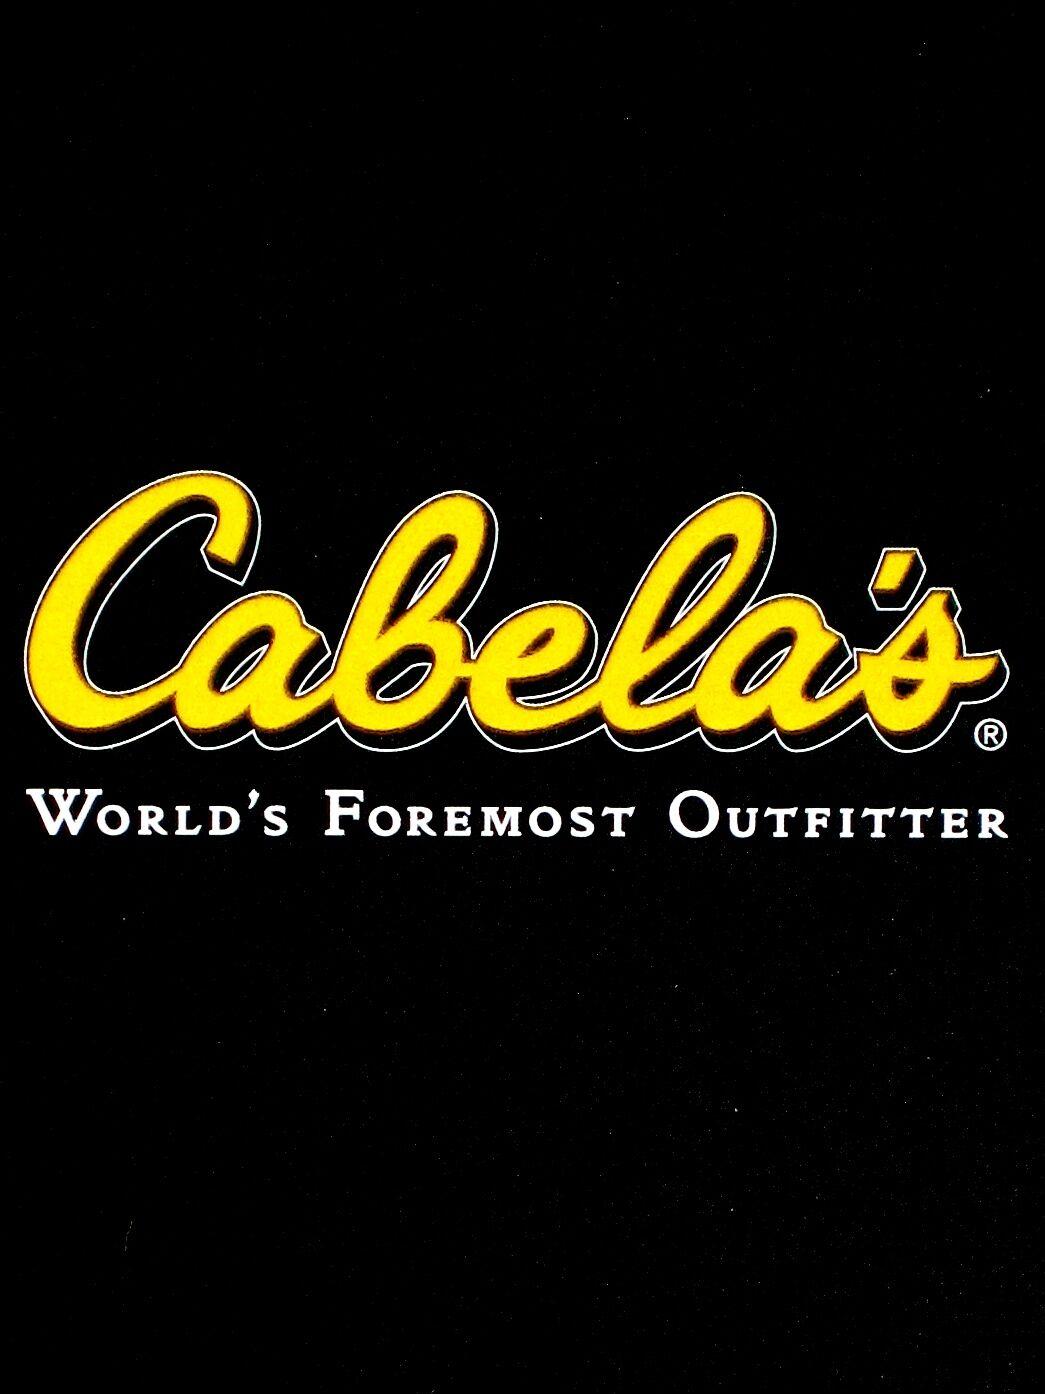 bd7acccb9cd9b ... Men's Windproof Waterproof Insulated 125G Hunting Bibs Realtree AP Camo Cabela's  Men's Windproof Waterproof Insulated 125G Hunting Bibs Realtree AP Camo ...